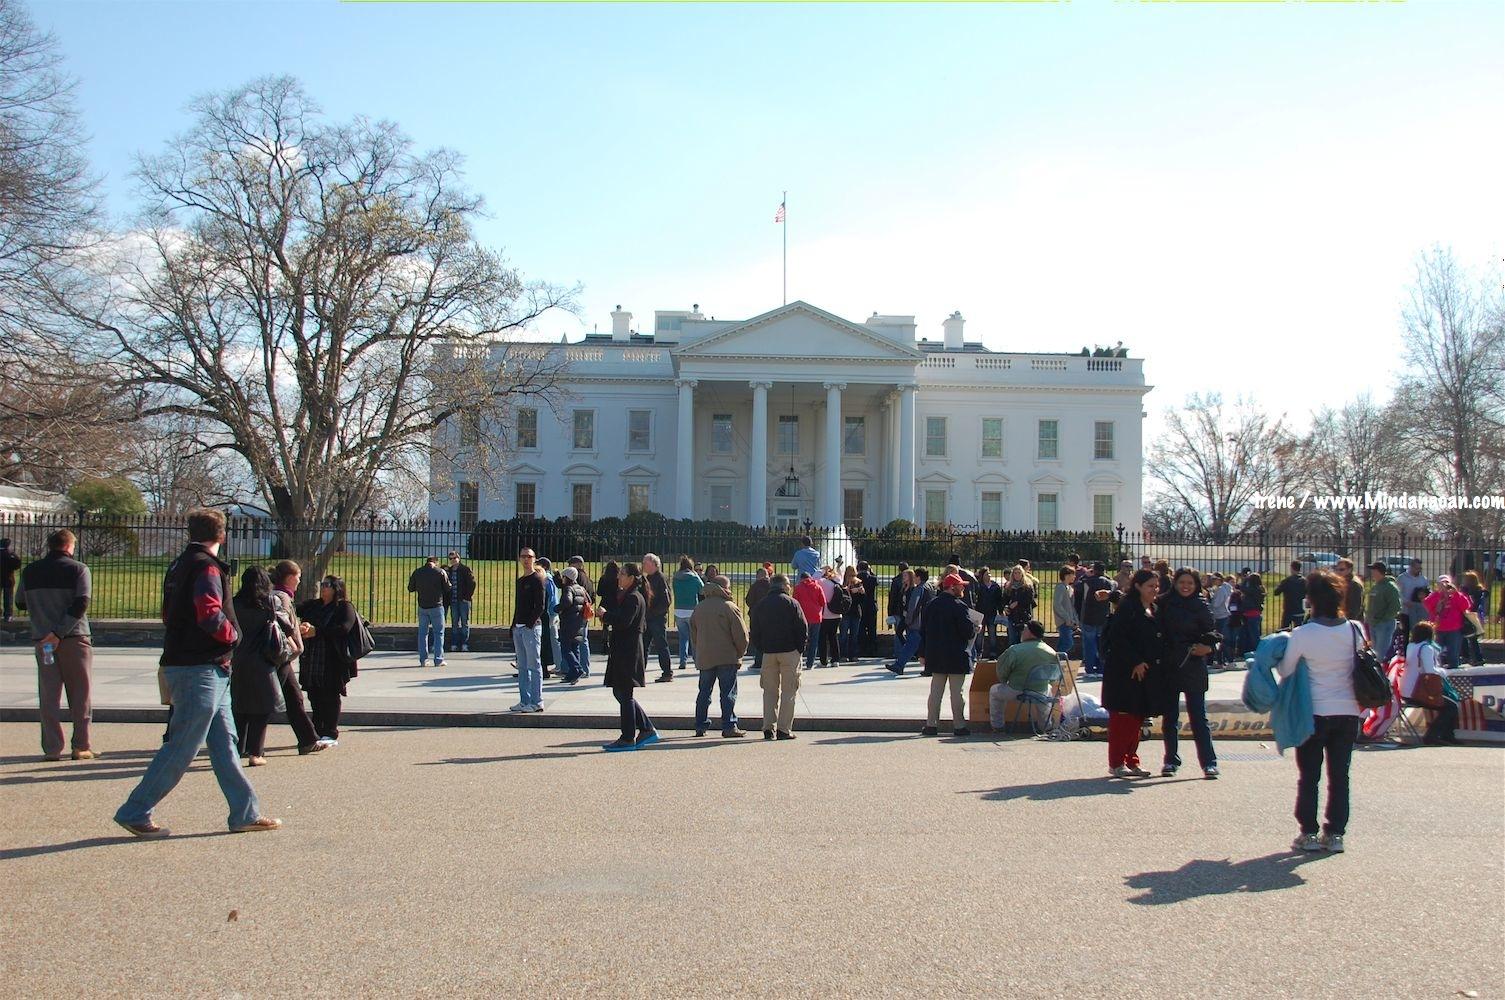 Mindanaoan In America: More Washington DC photos